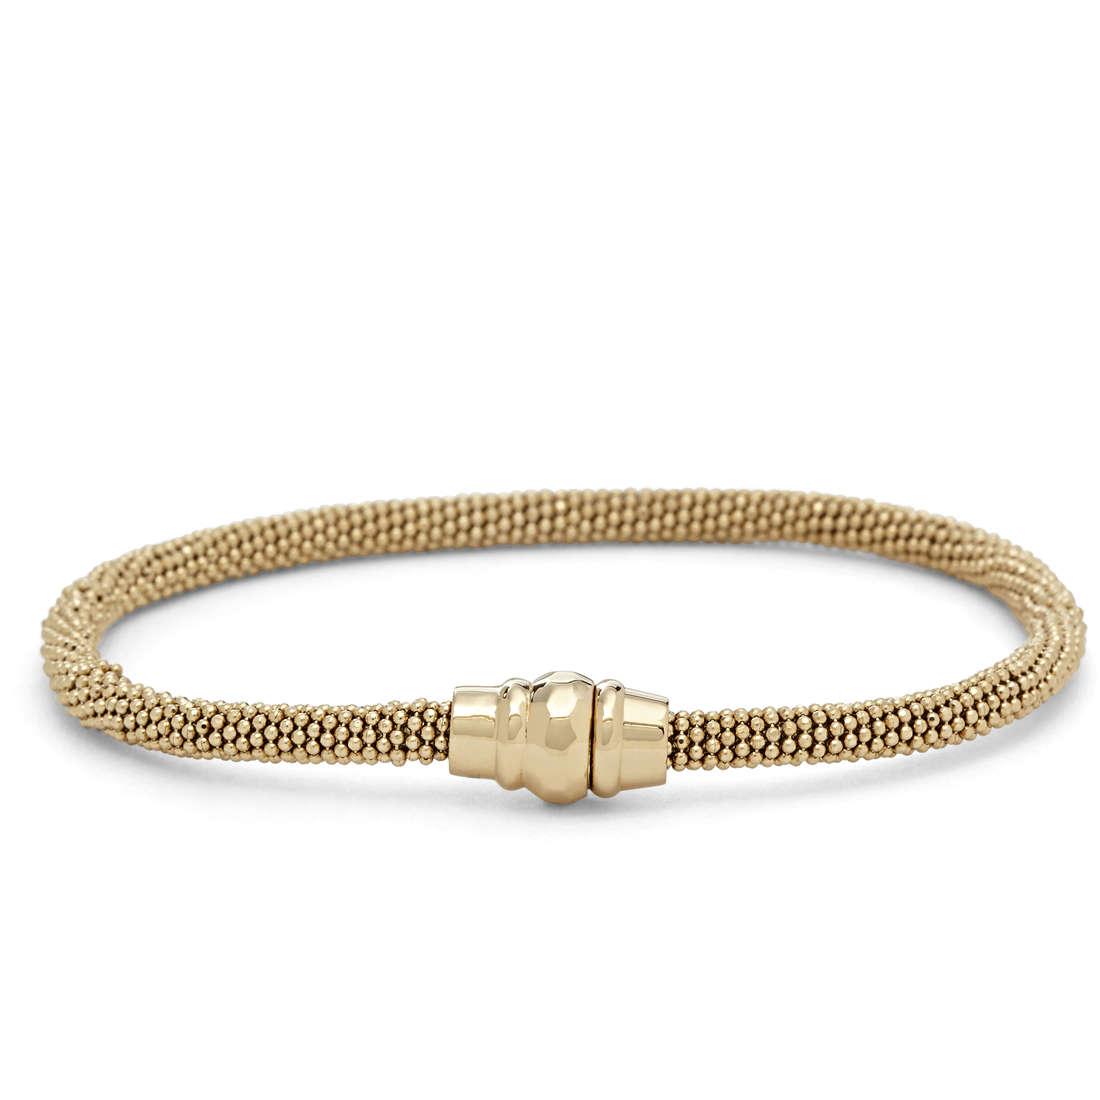 bracelet woman jewellery Fossil JA6295710